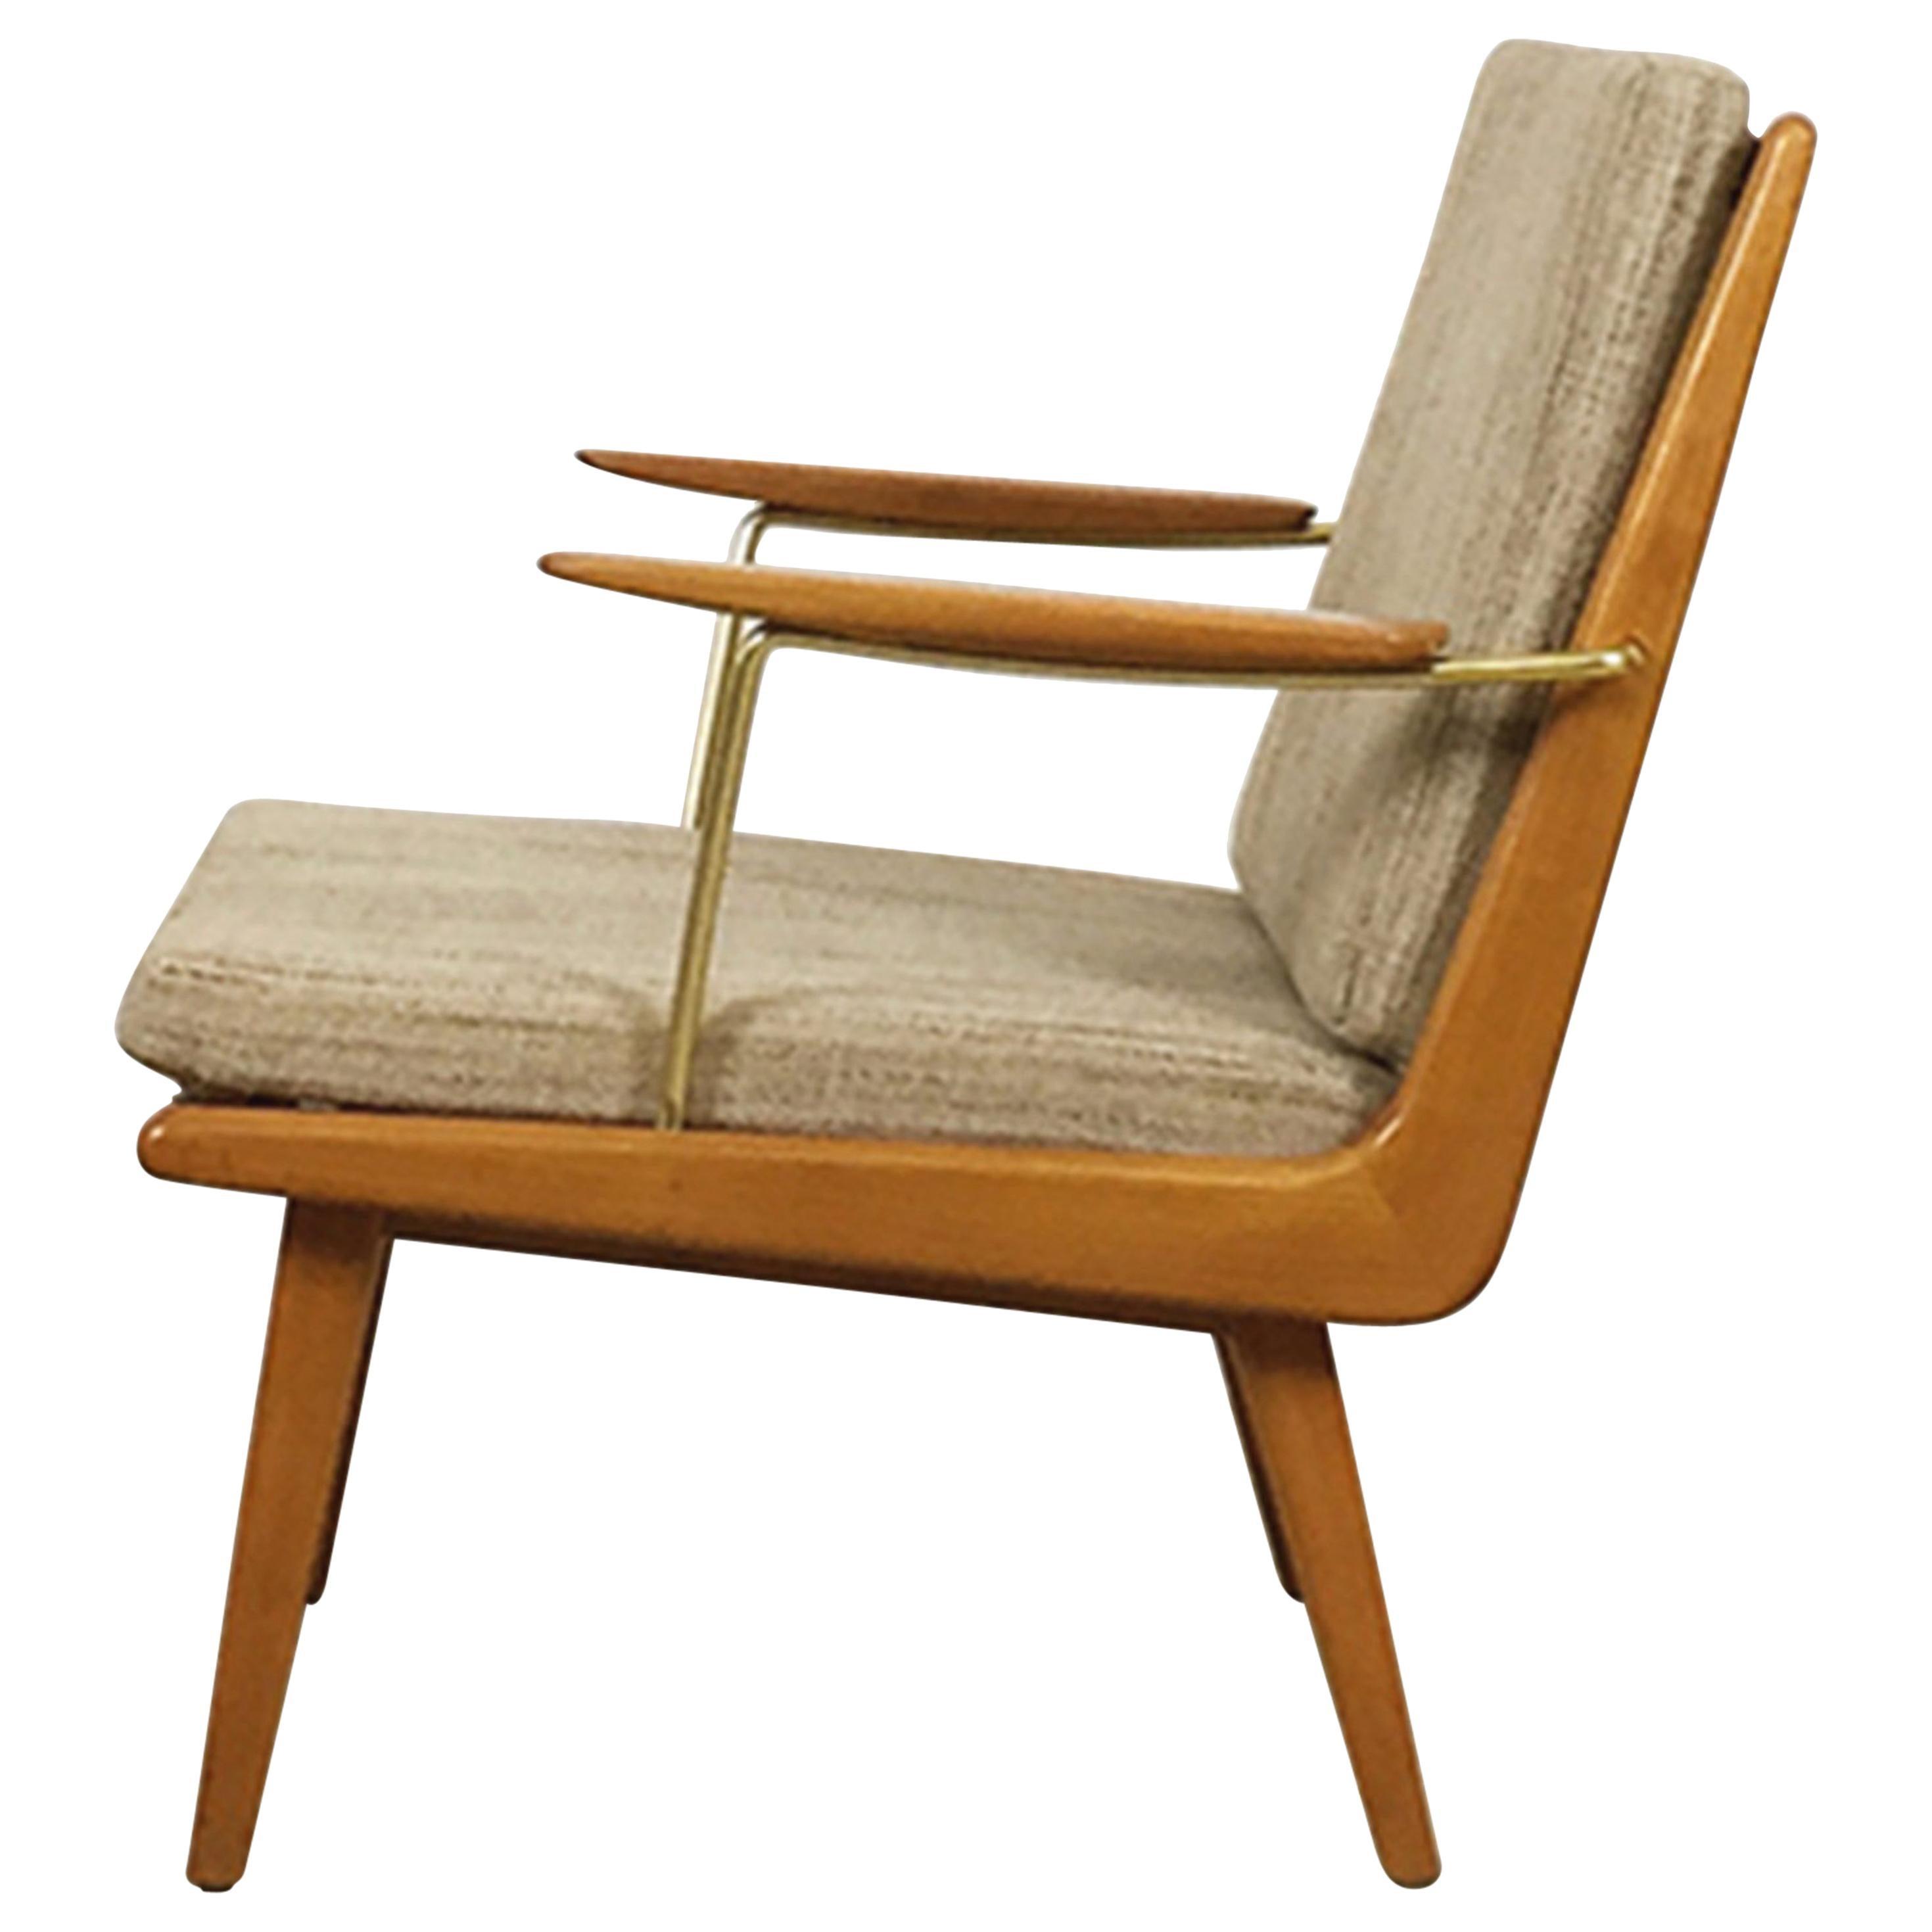 1950s Boomerang Easy Chair by Hans Mitzlaff for Eugen Schmidt, Soloform, Germany